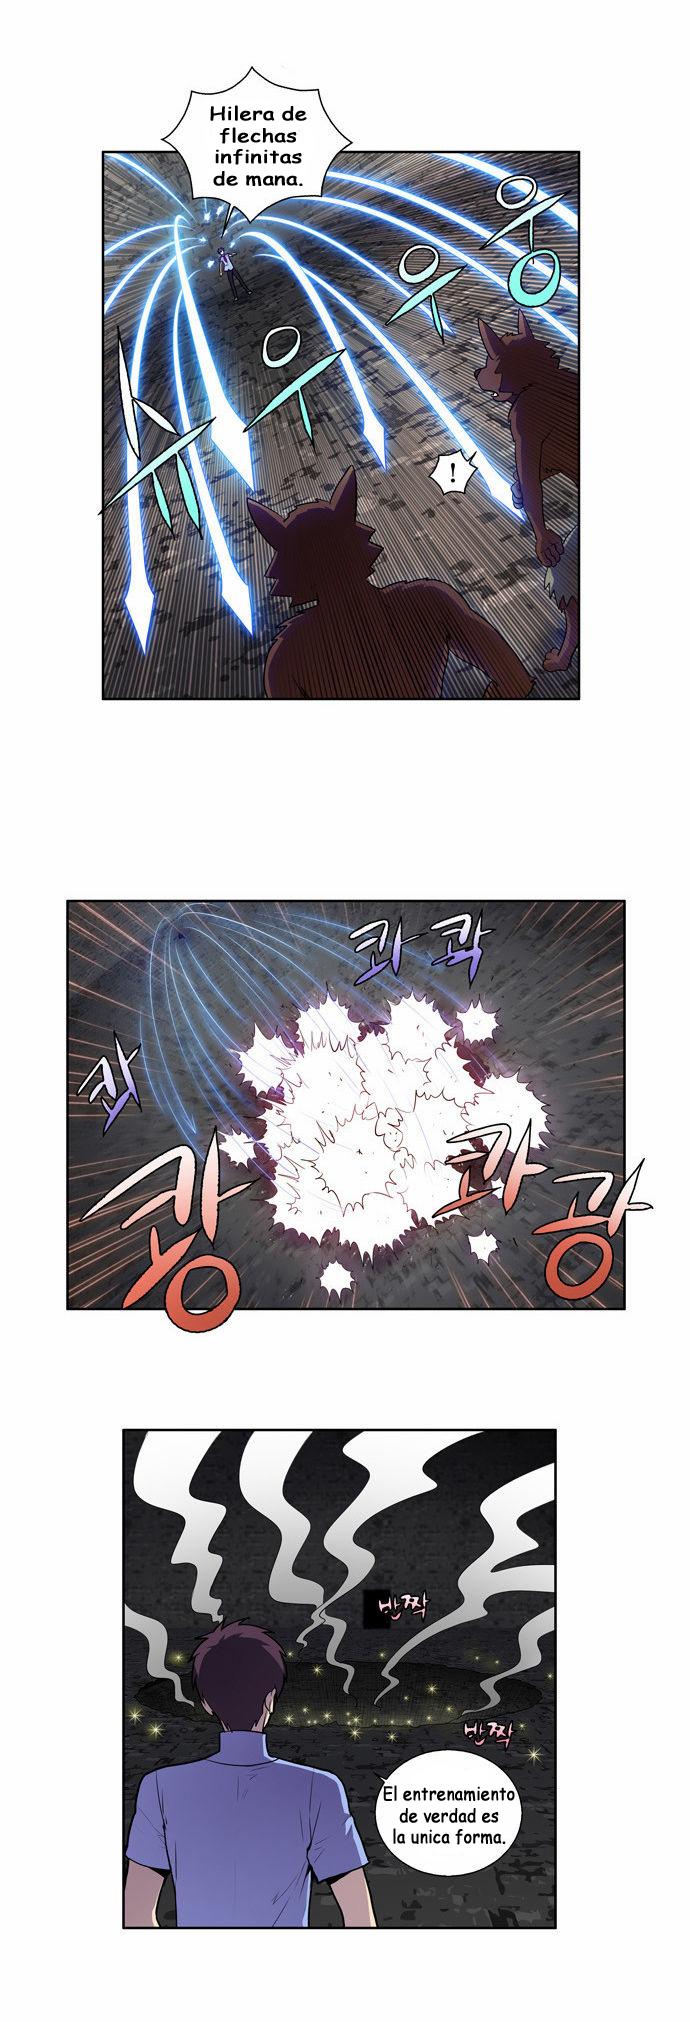 https://c5.ninemanga.com/es_manga/61/1725/396910/7149244de63a0baa9bd91ff165cfaf79.jpg Page 8